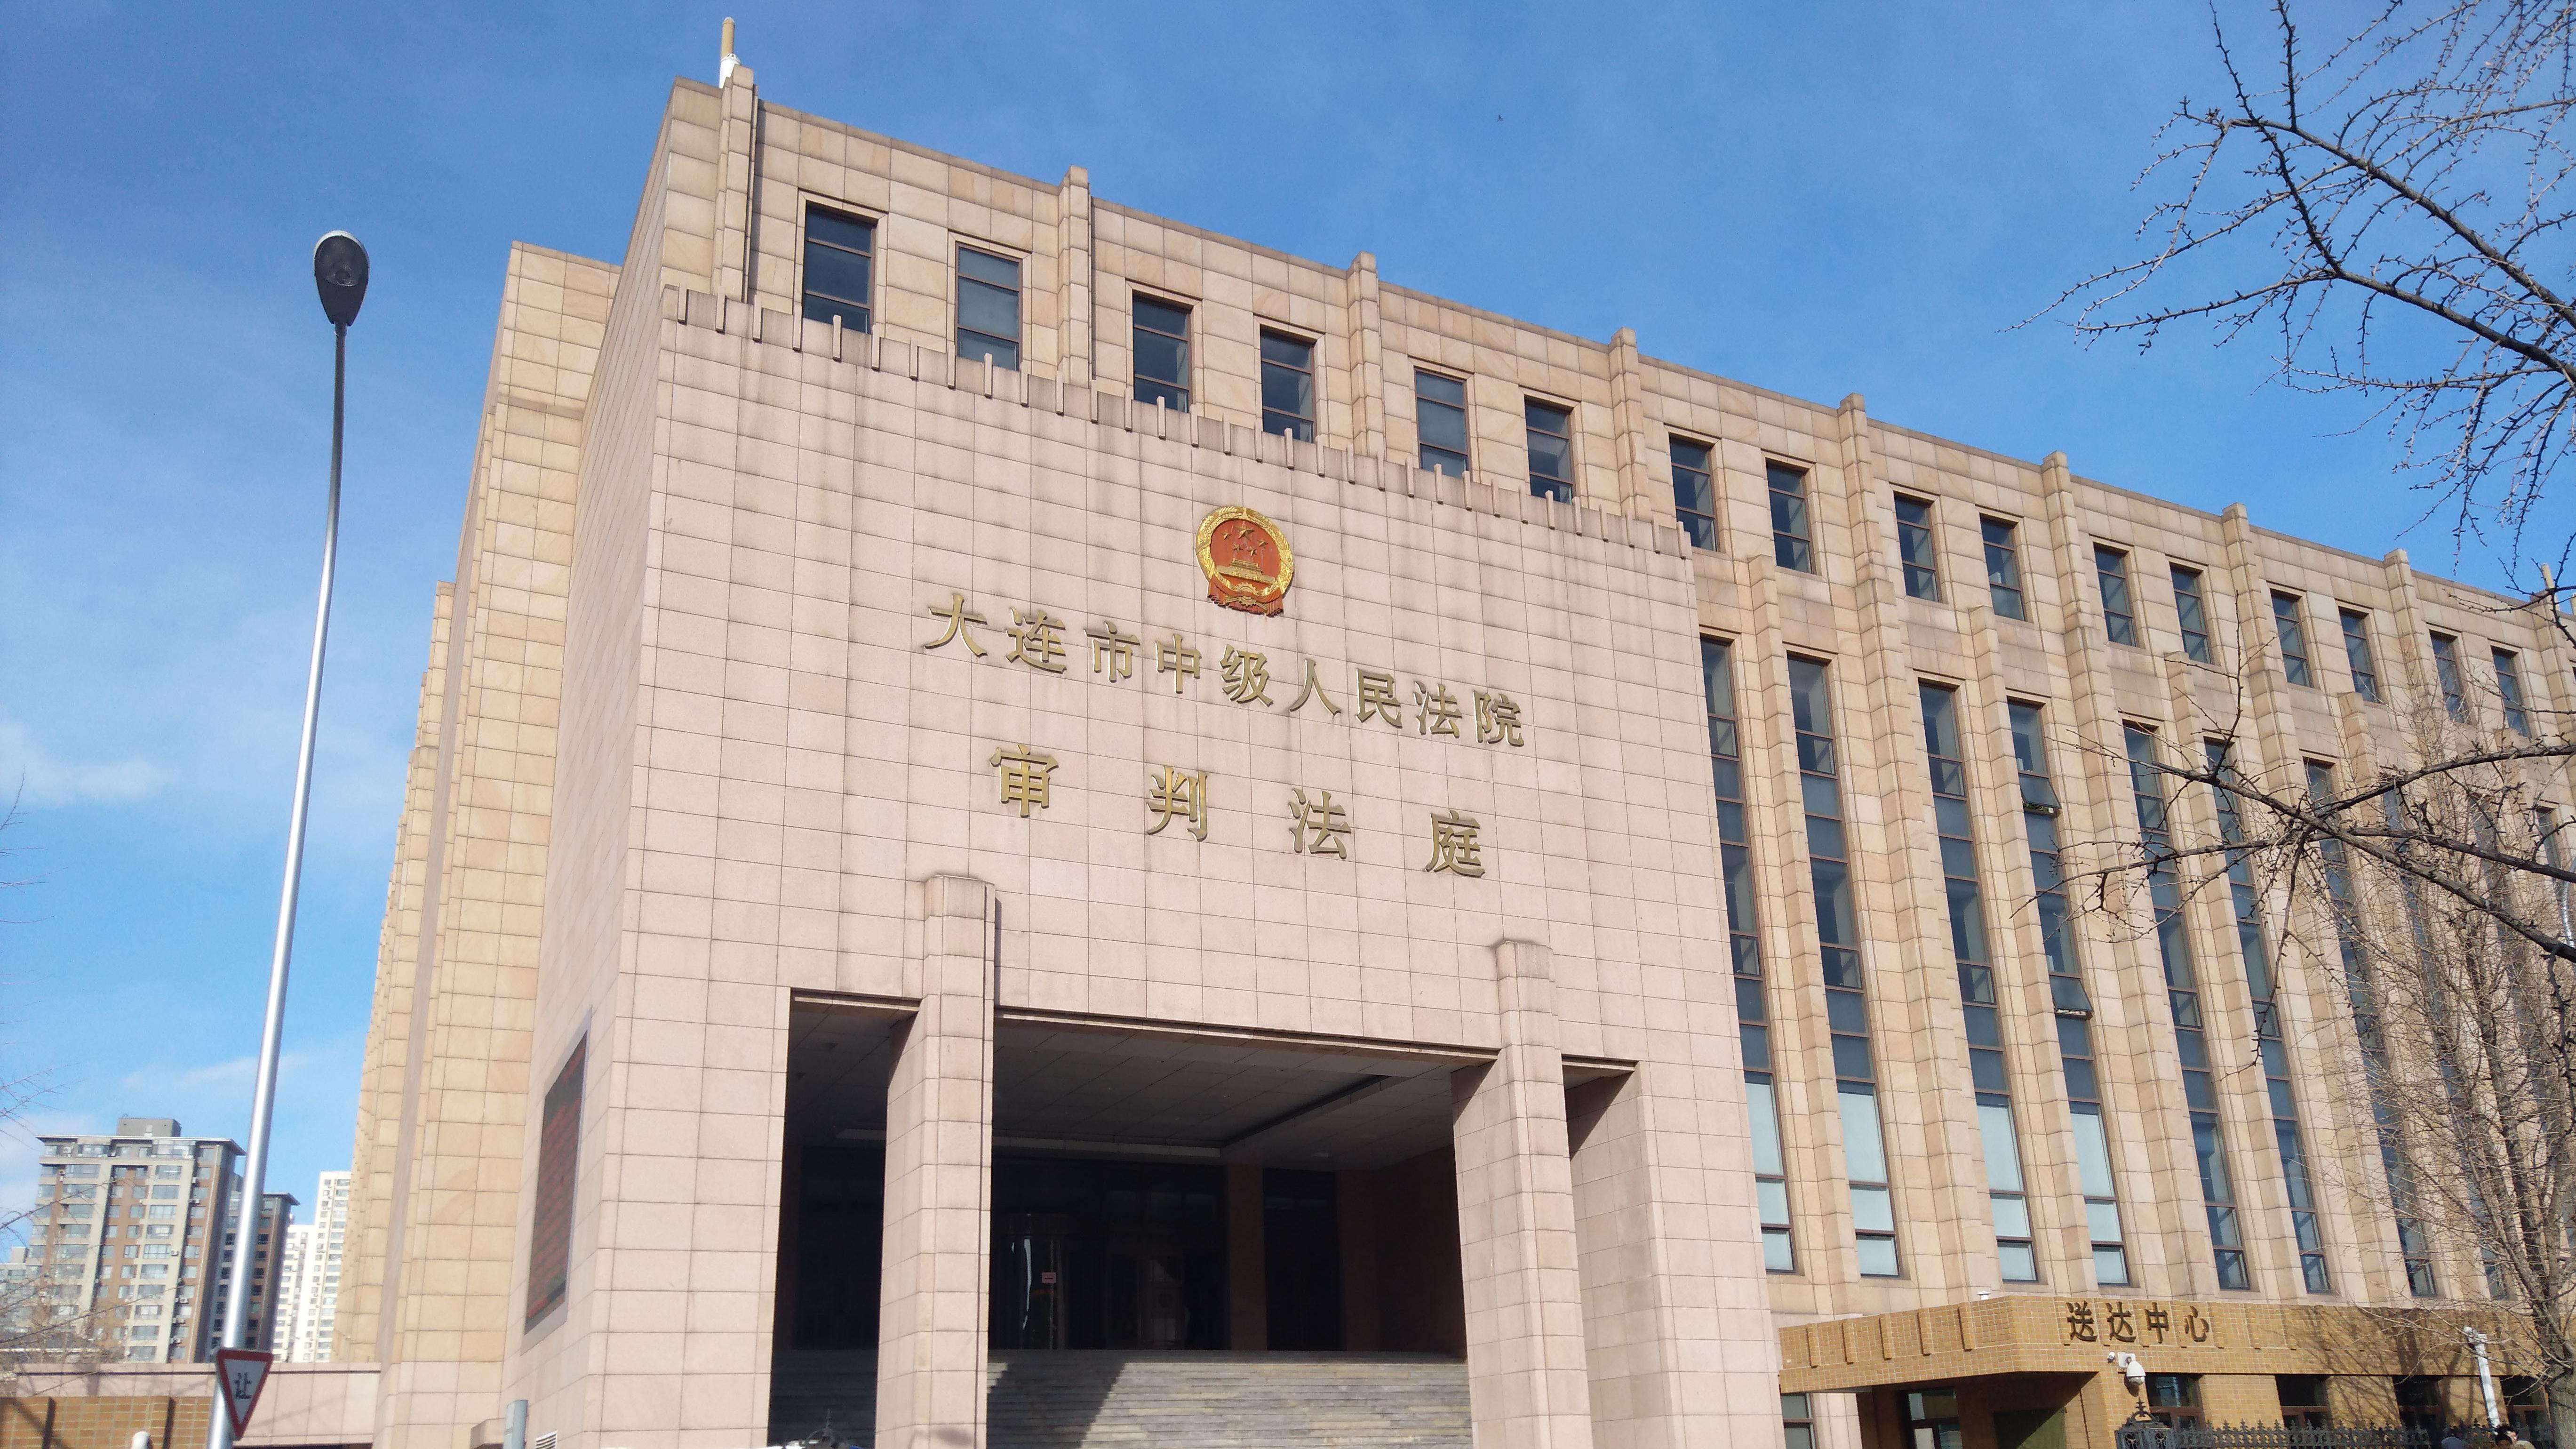 Gerichtsgebäude in Dalian, China